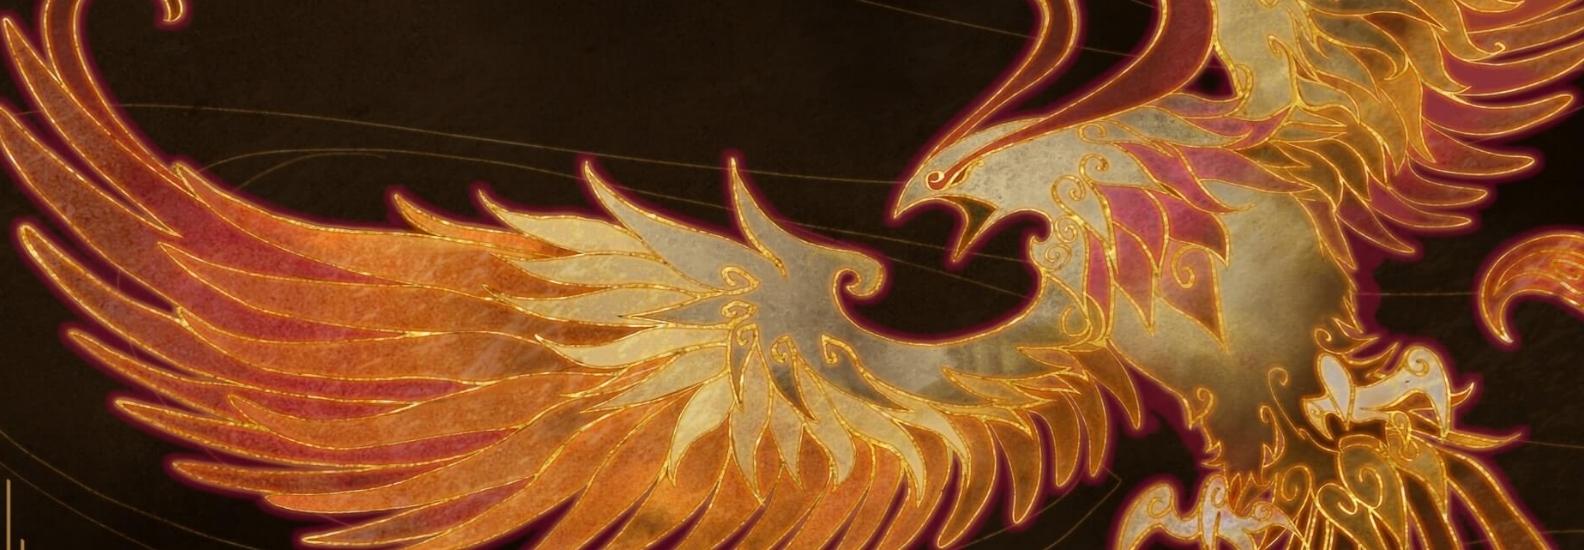 Vermillion Crucible loading screen for Phoenix - Valve